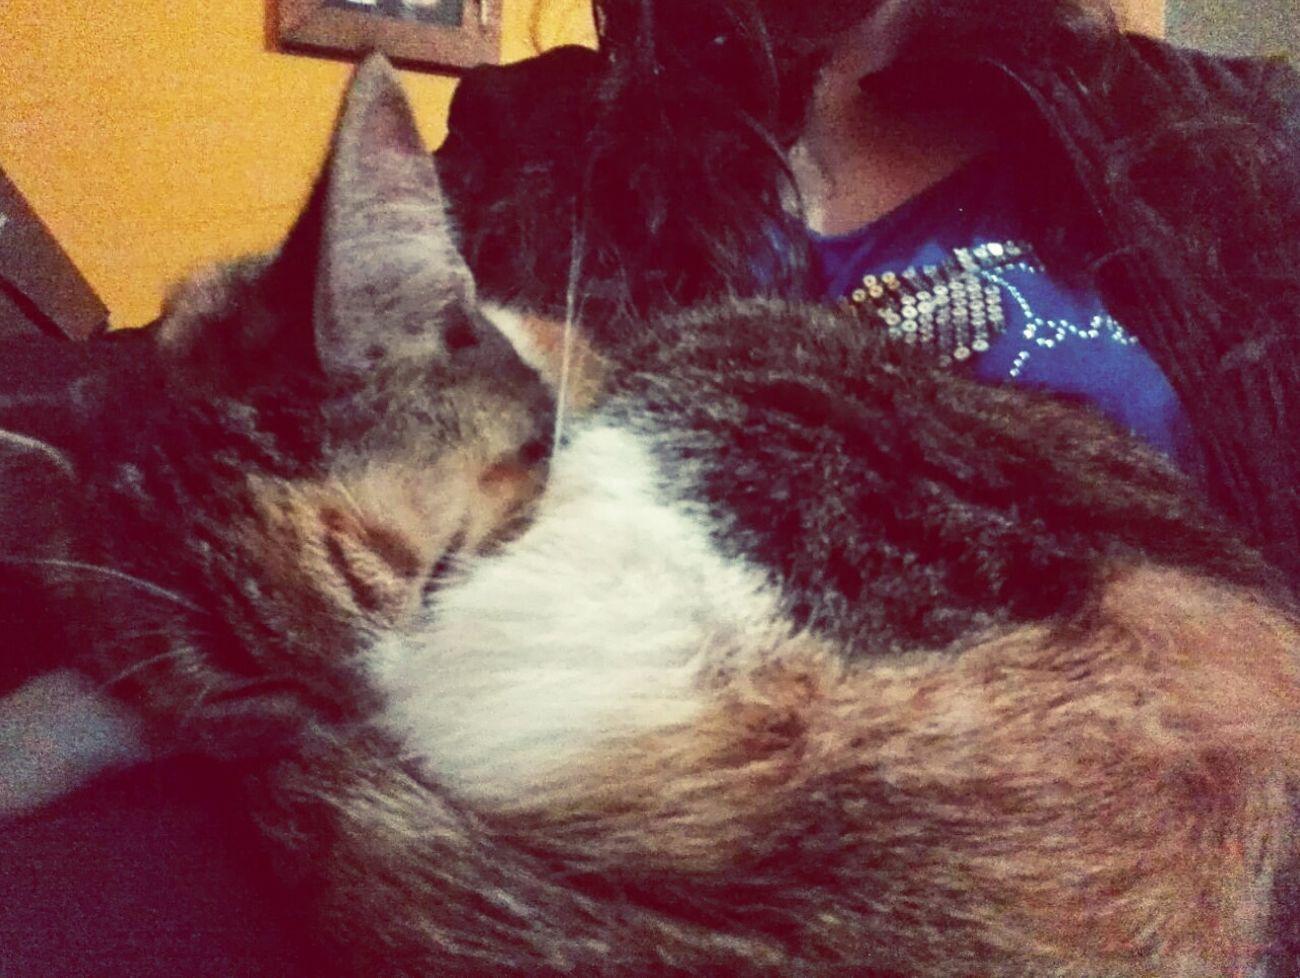 Ella me usa de almohadon ♡ Gatuno Gatitos Gatita  Cats 🐱 Catlovers Cats Of EyeEm Catsofinstagram Cat♡ Cat Lovers Catsagram Cats Gatitas